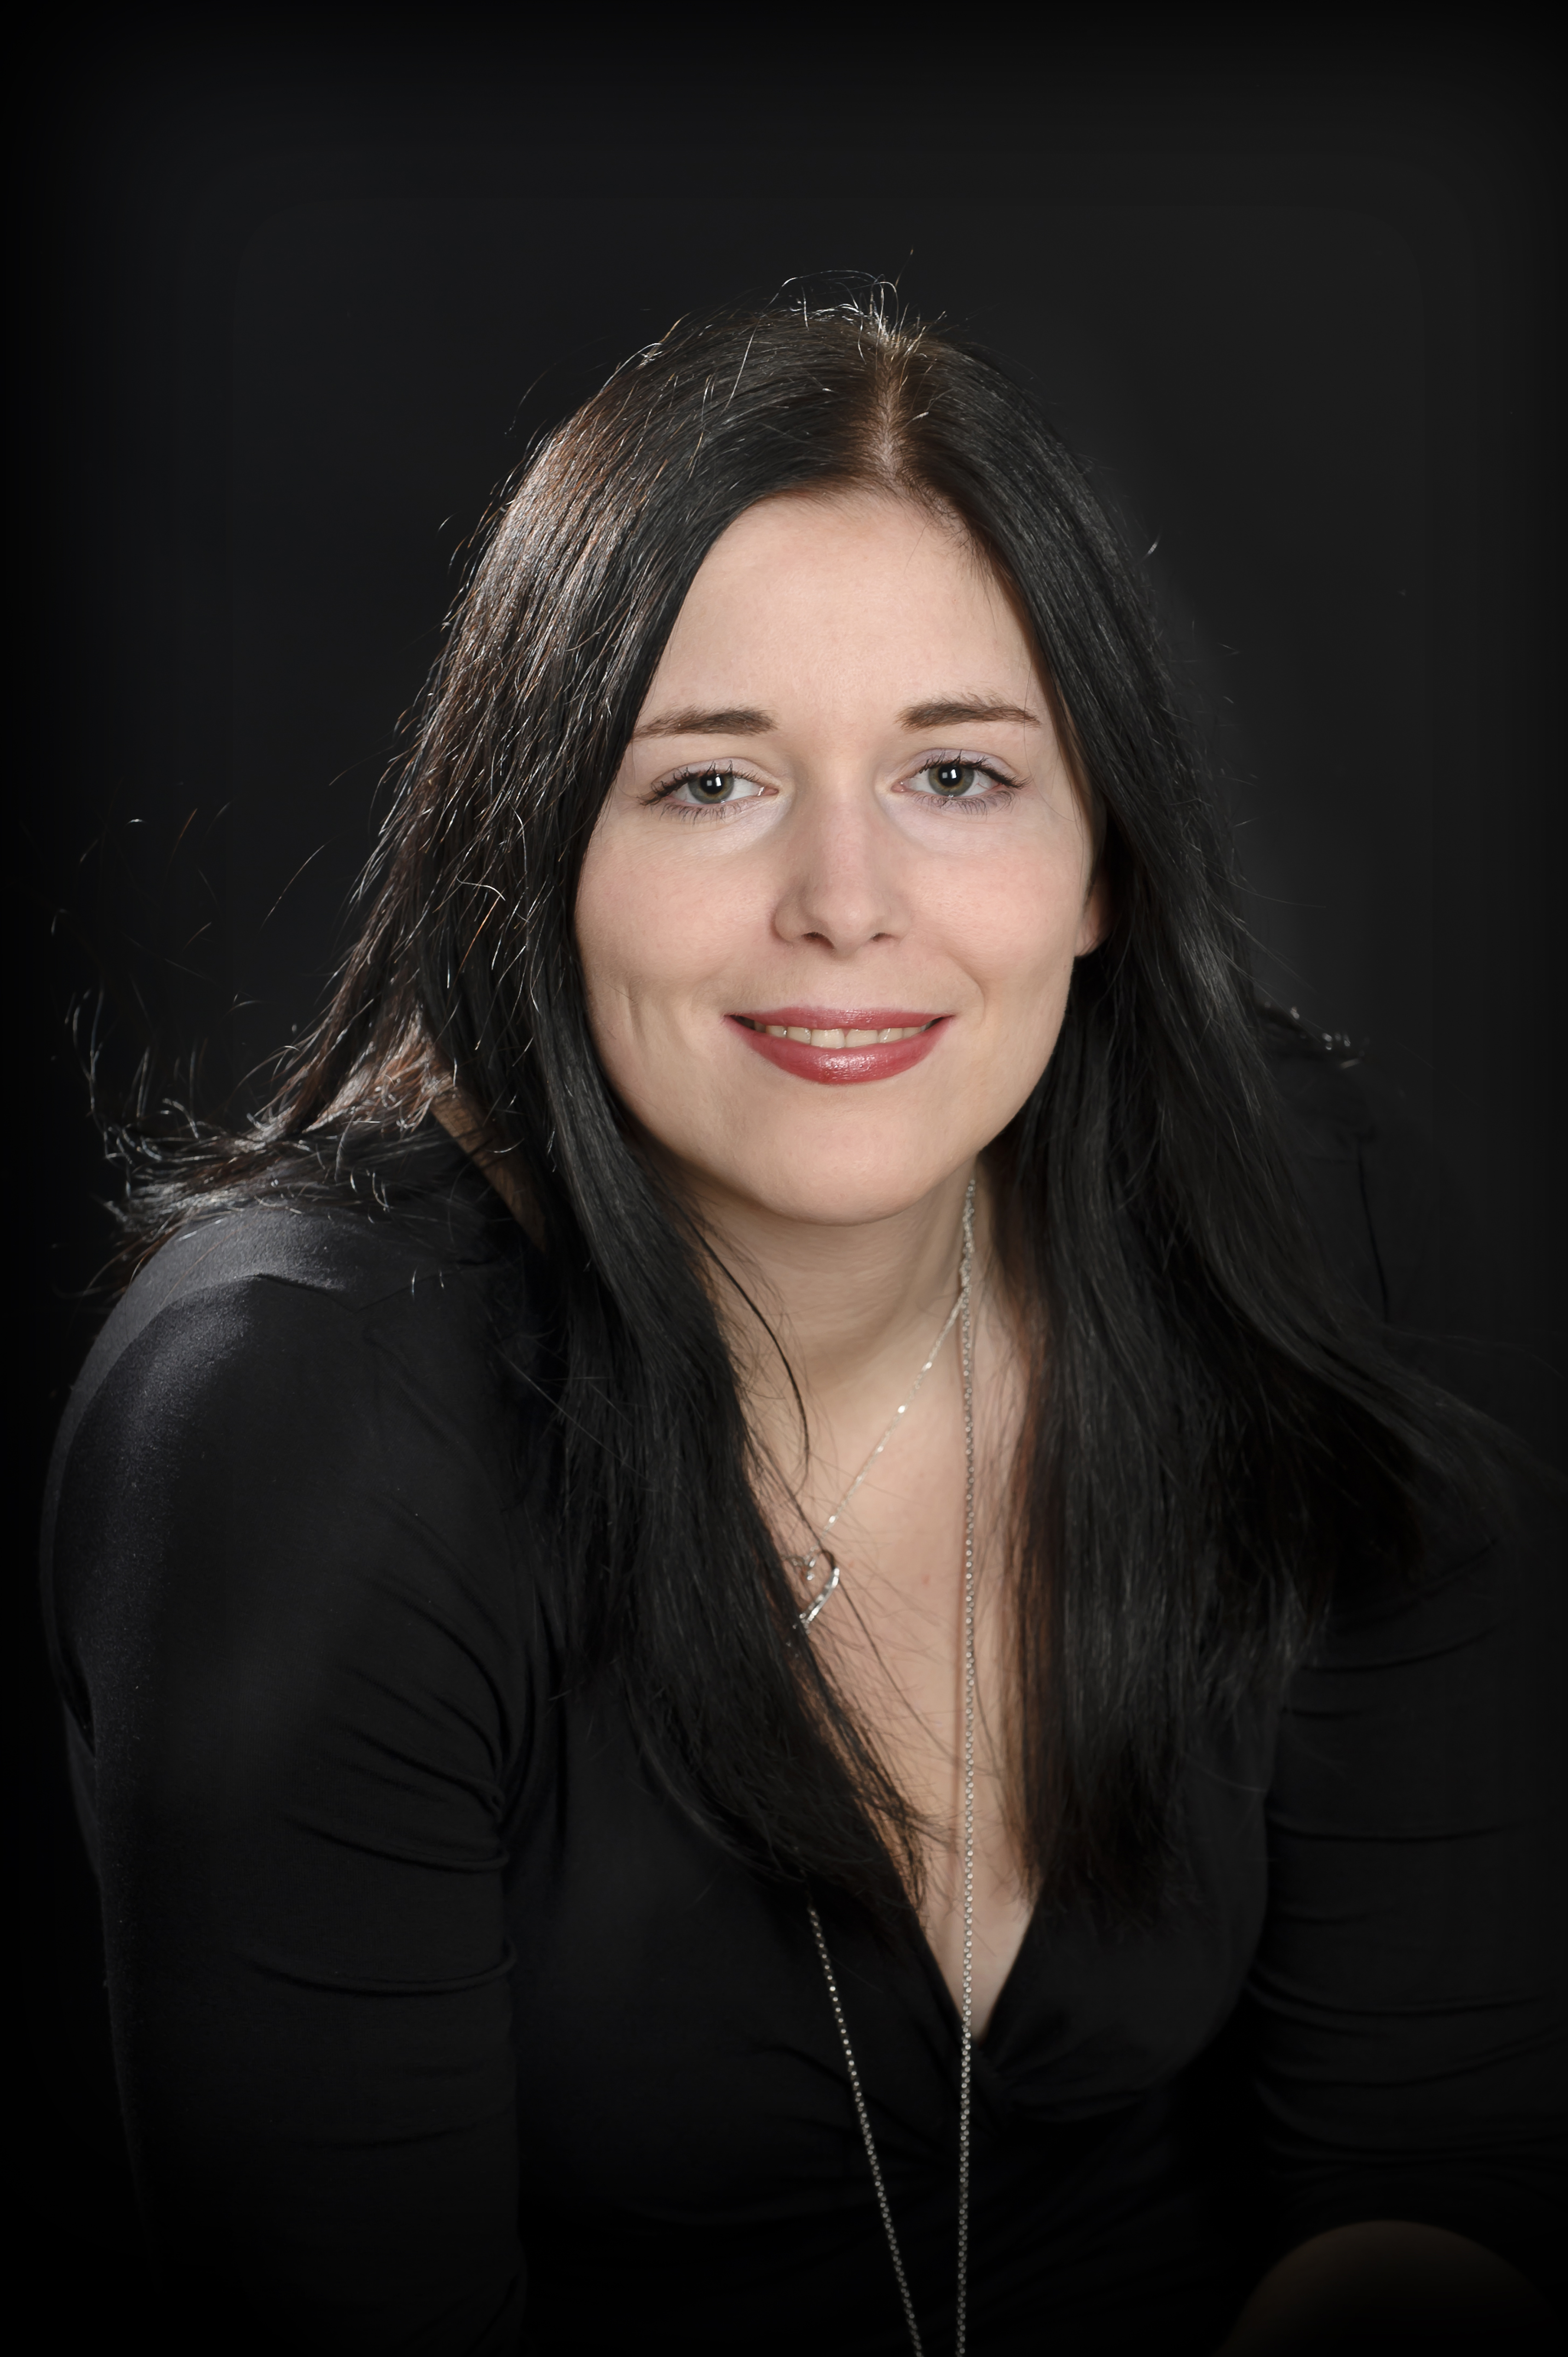 Nicole Rasser